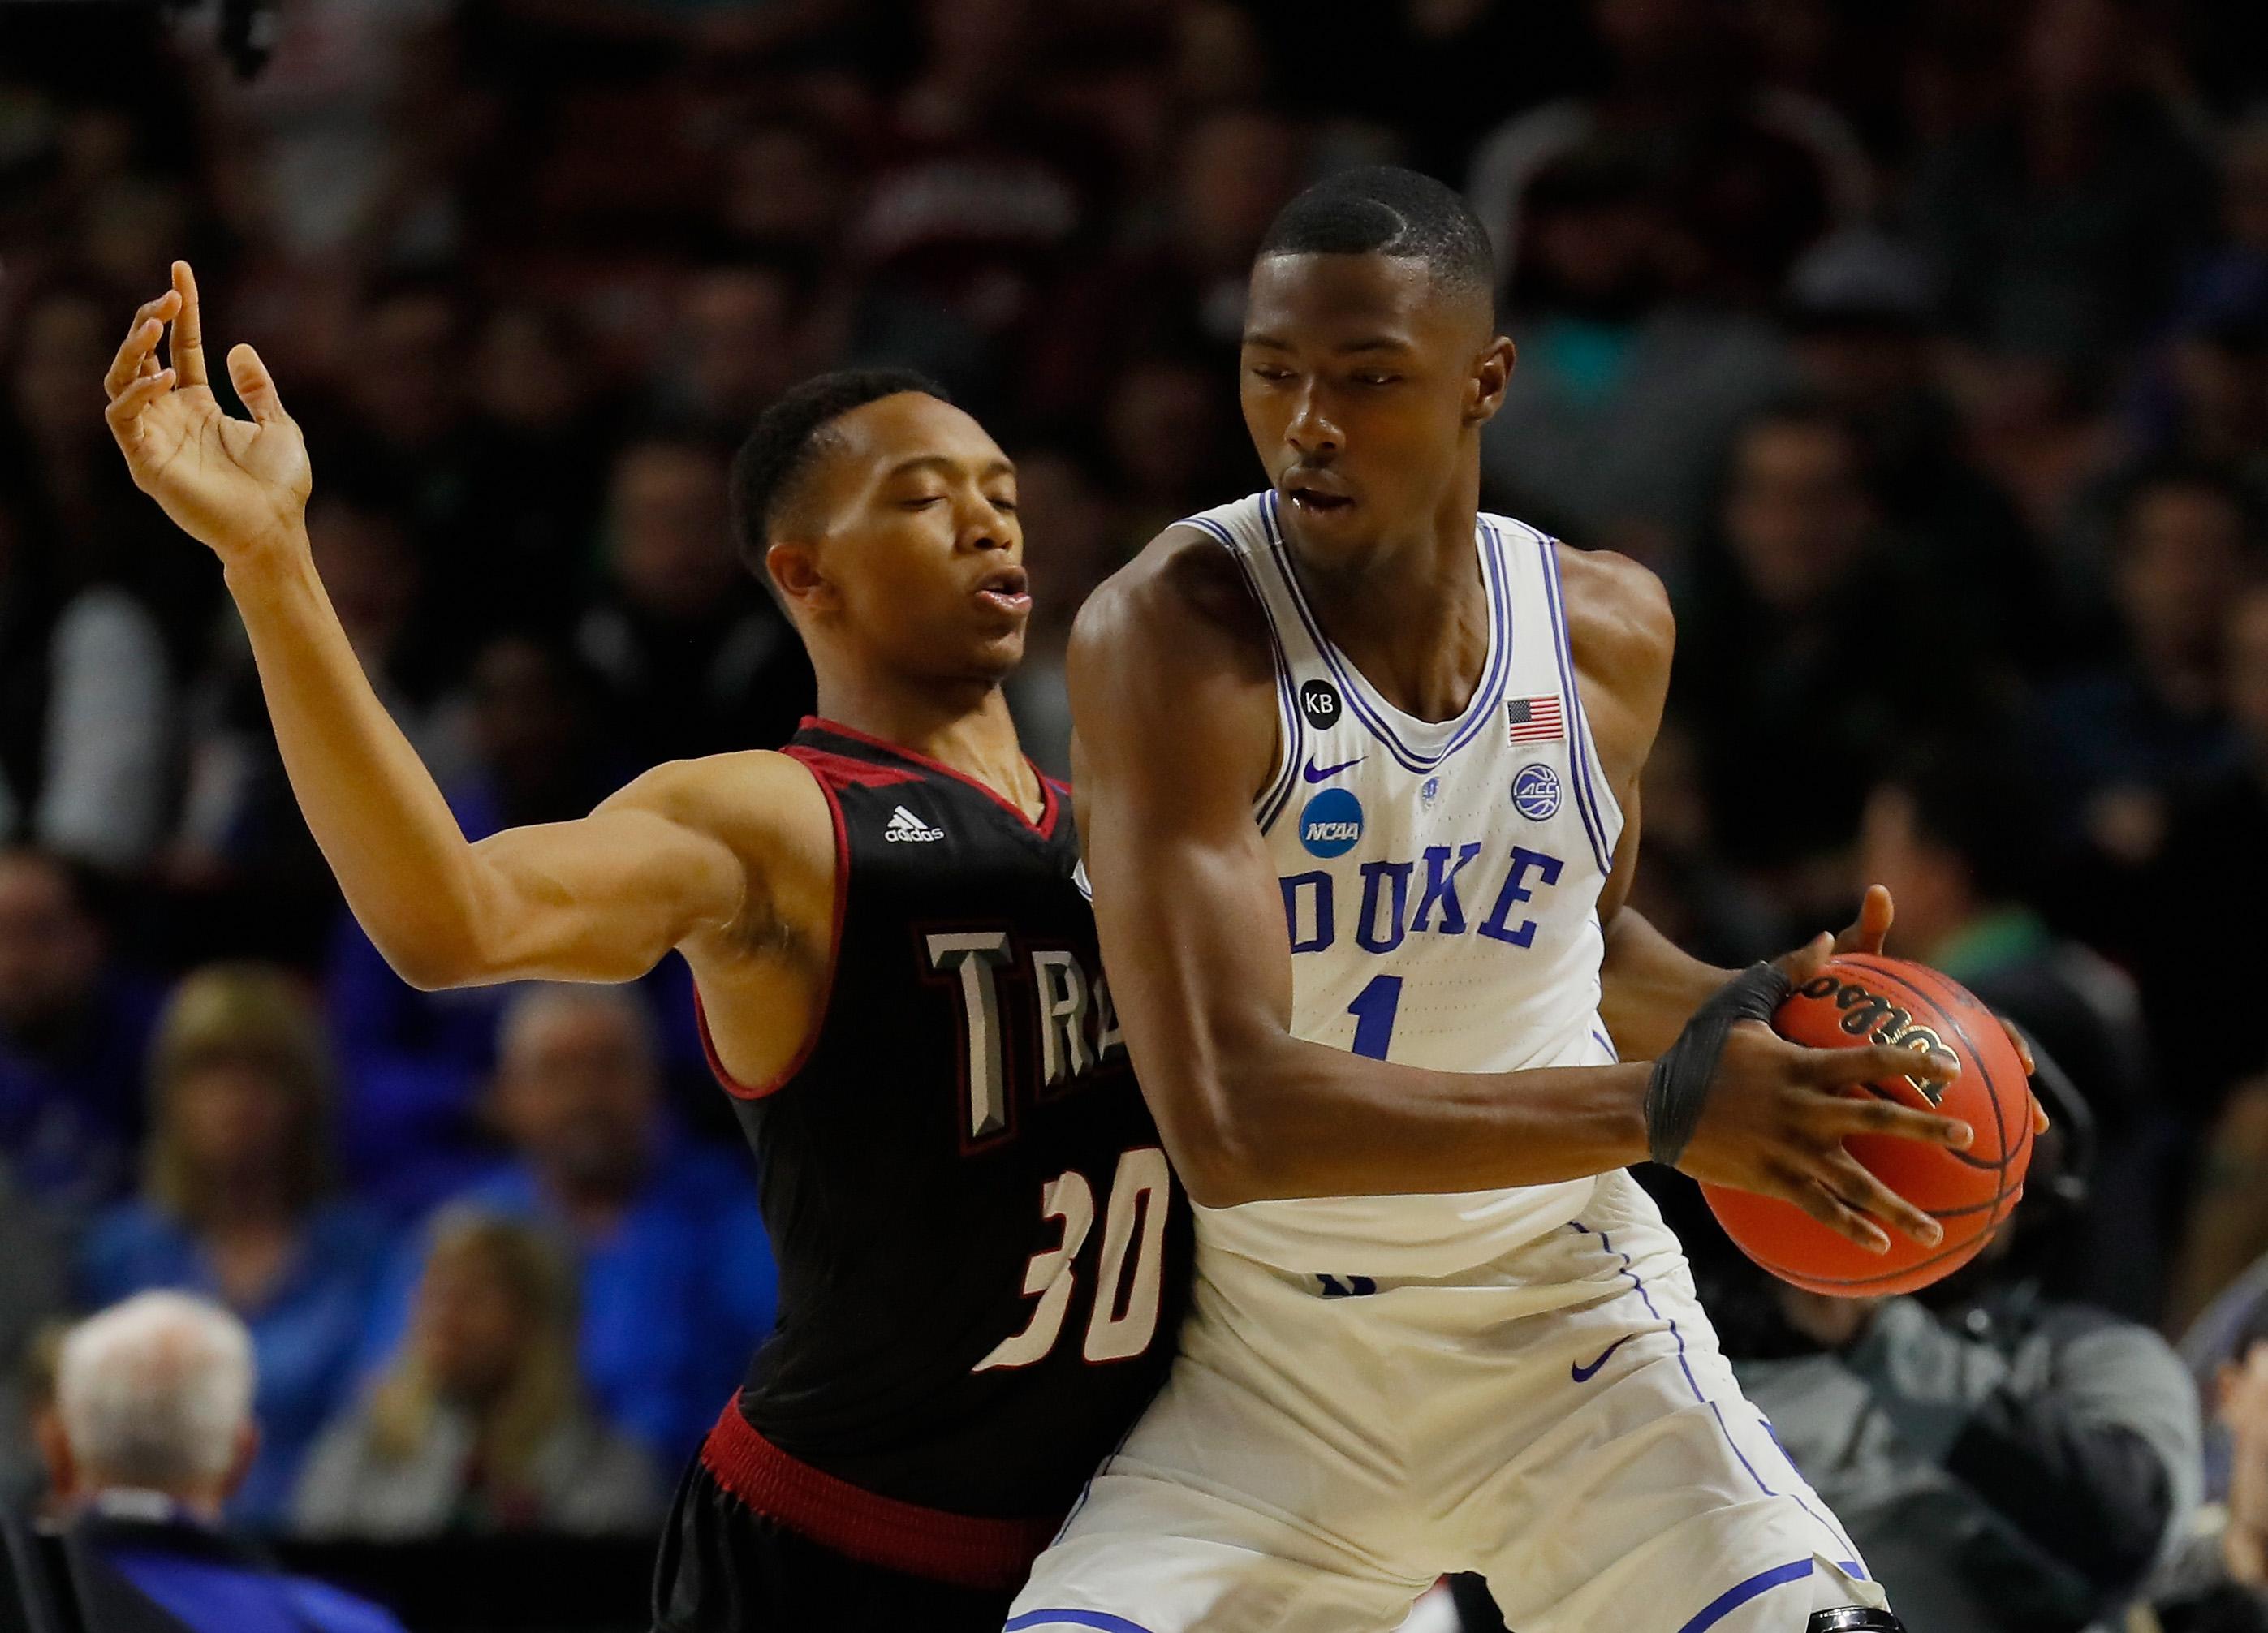 NCAA Basketball Tournament - First Round - Troy v Duke